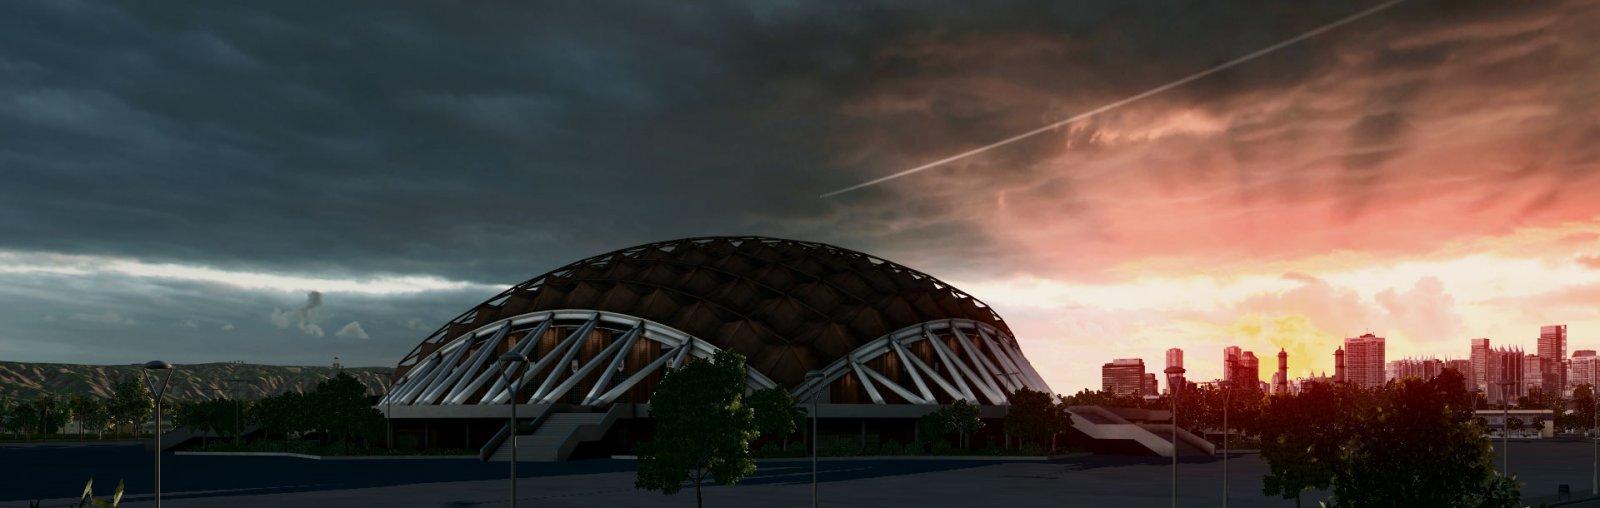 Arena7.jpg